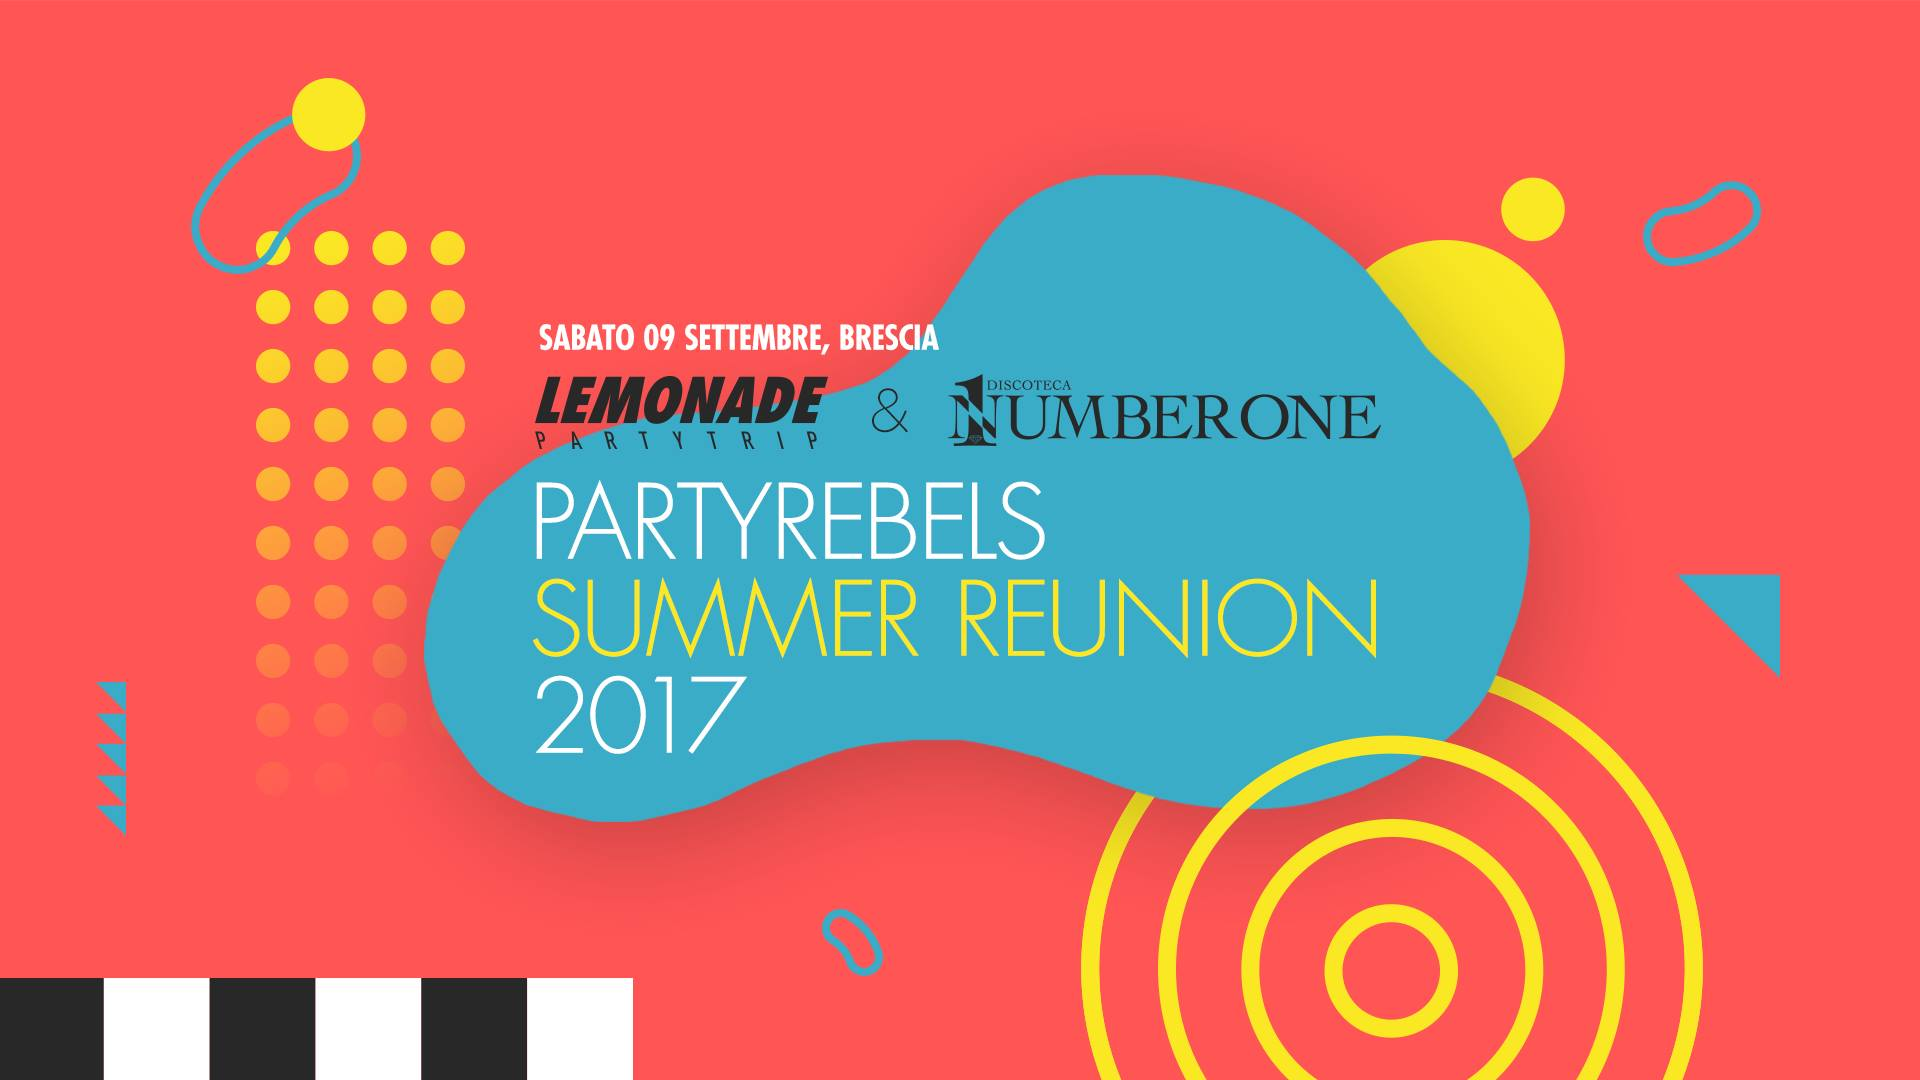 Partyrebels Summer Reunion 2017